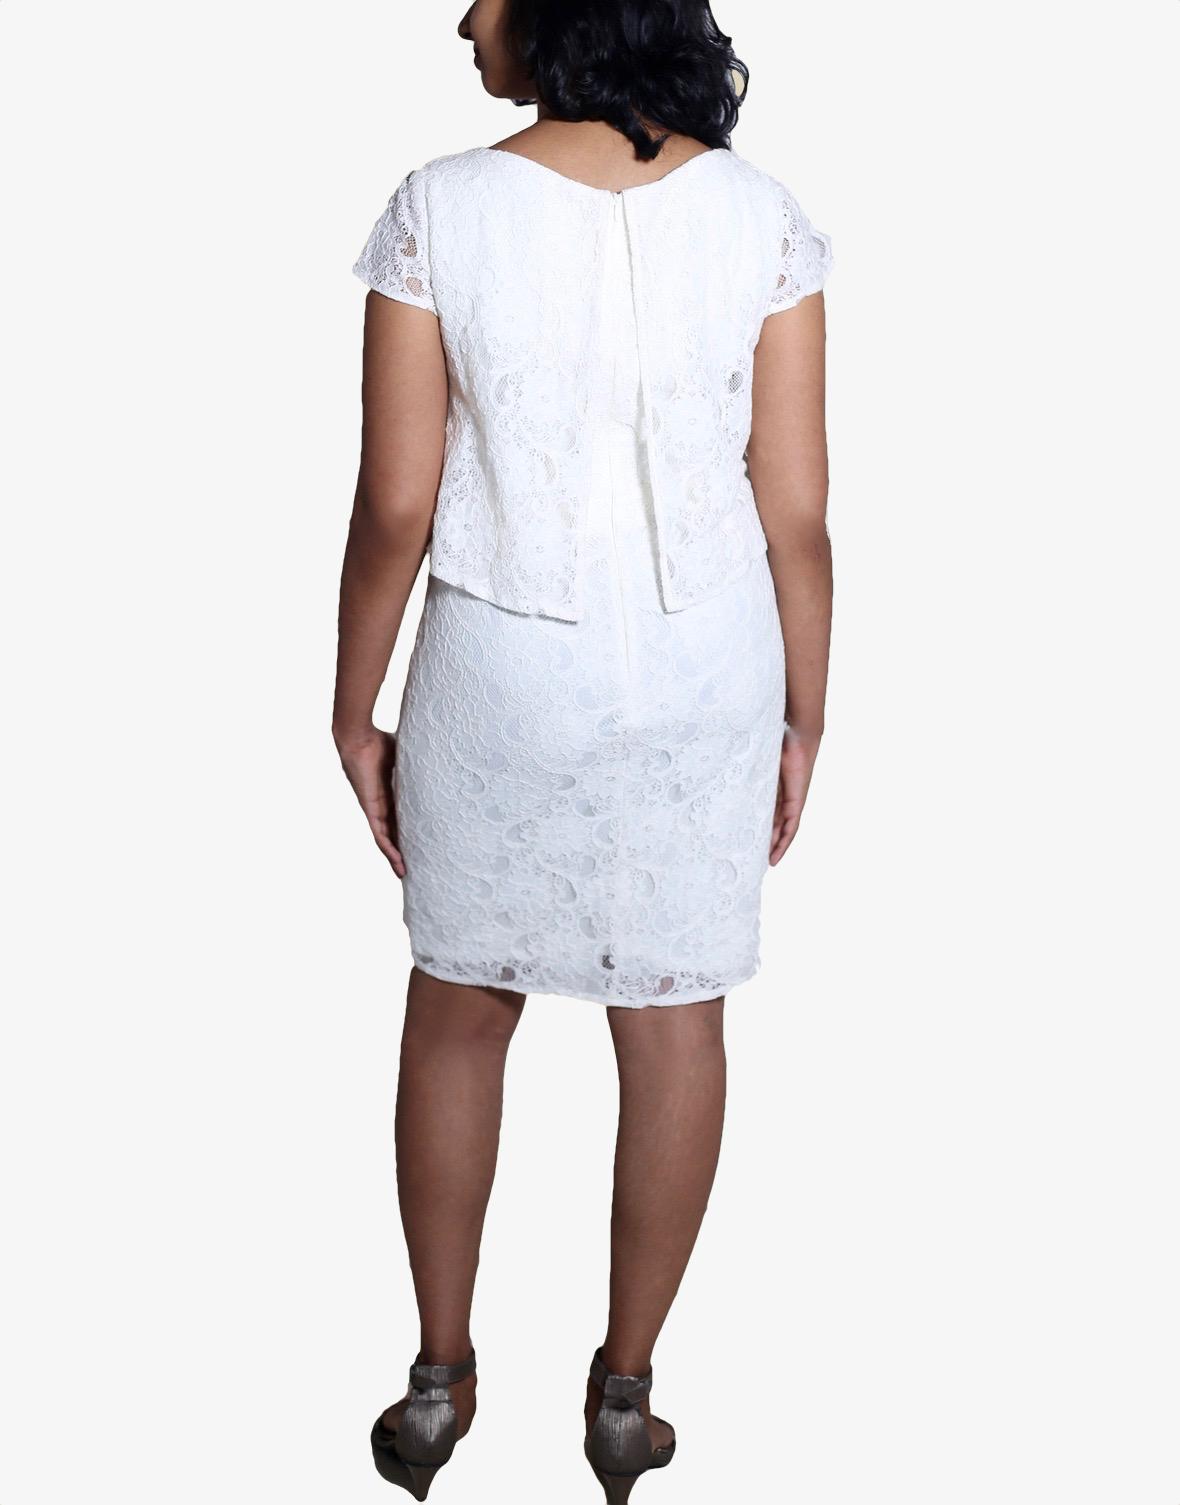 White Overlay Lace Dress